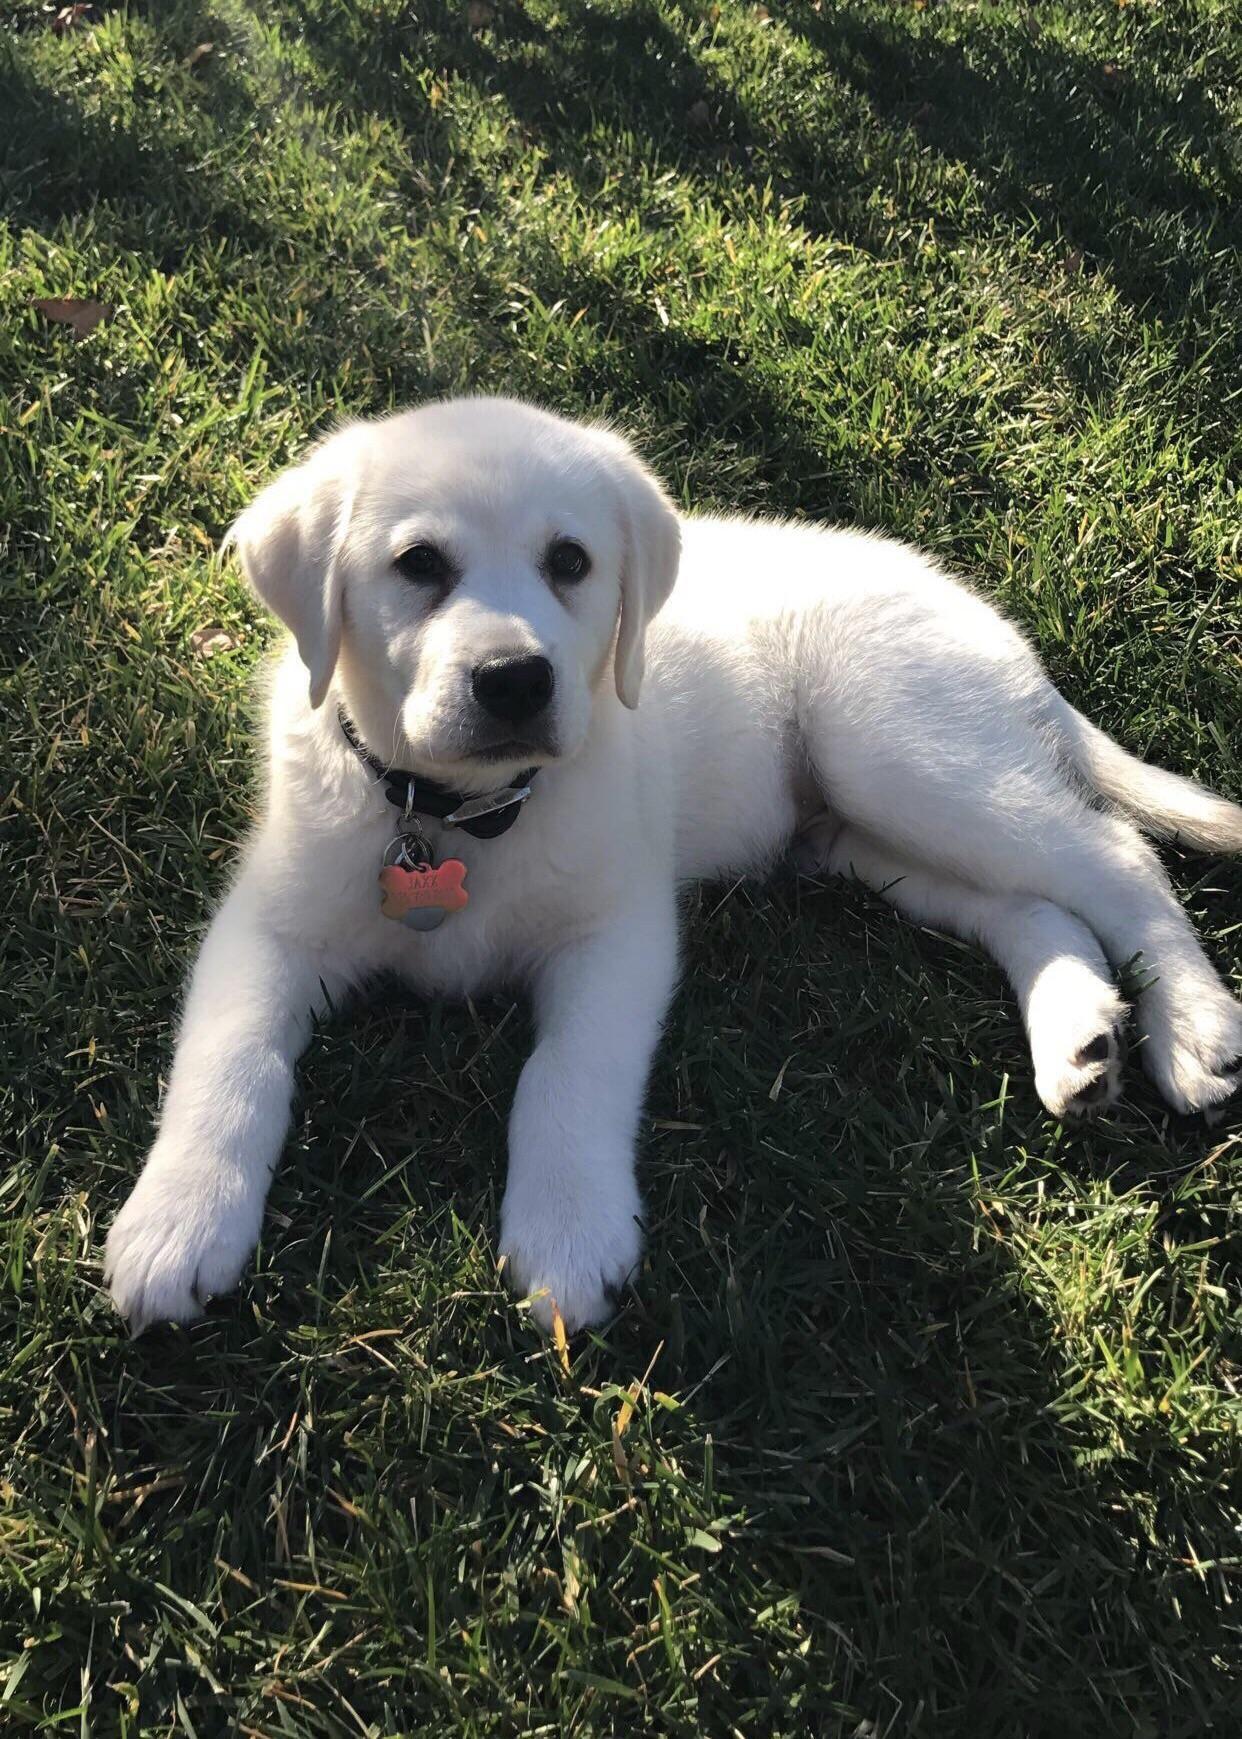 Jaxx The Super Cute Fluffy White Lab Puppy Http Ift Tt 2uuzewv